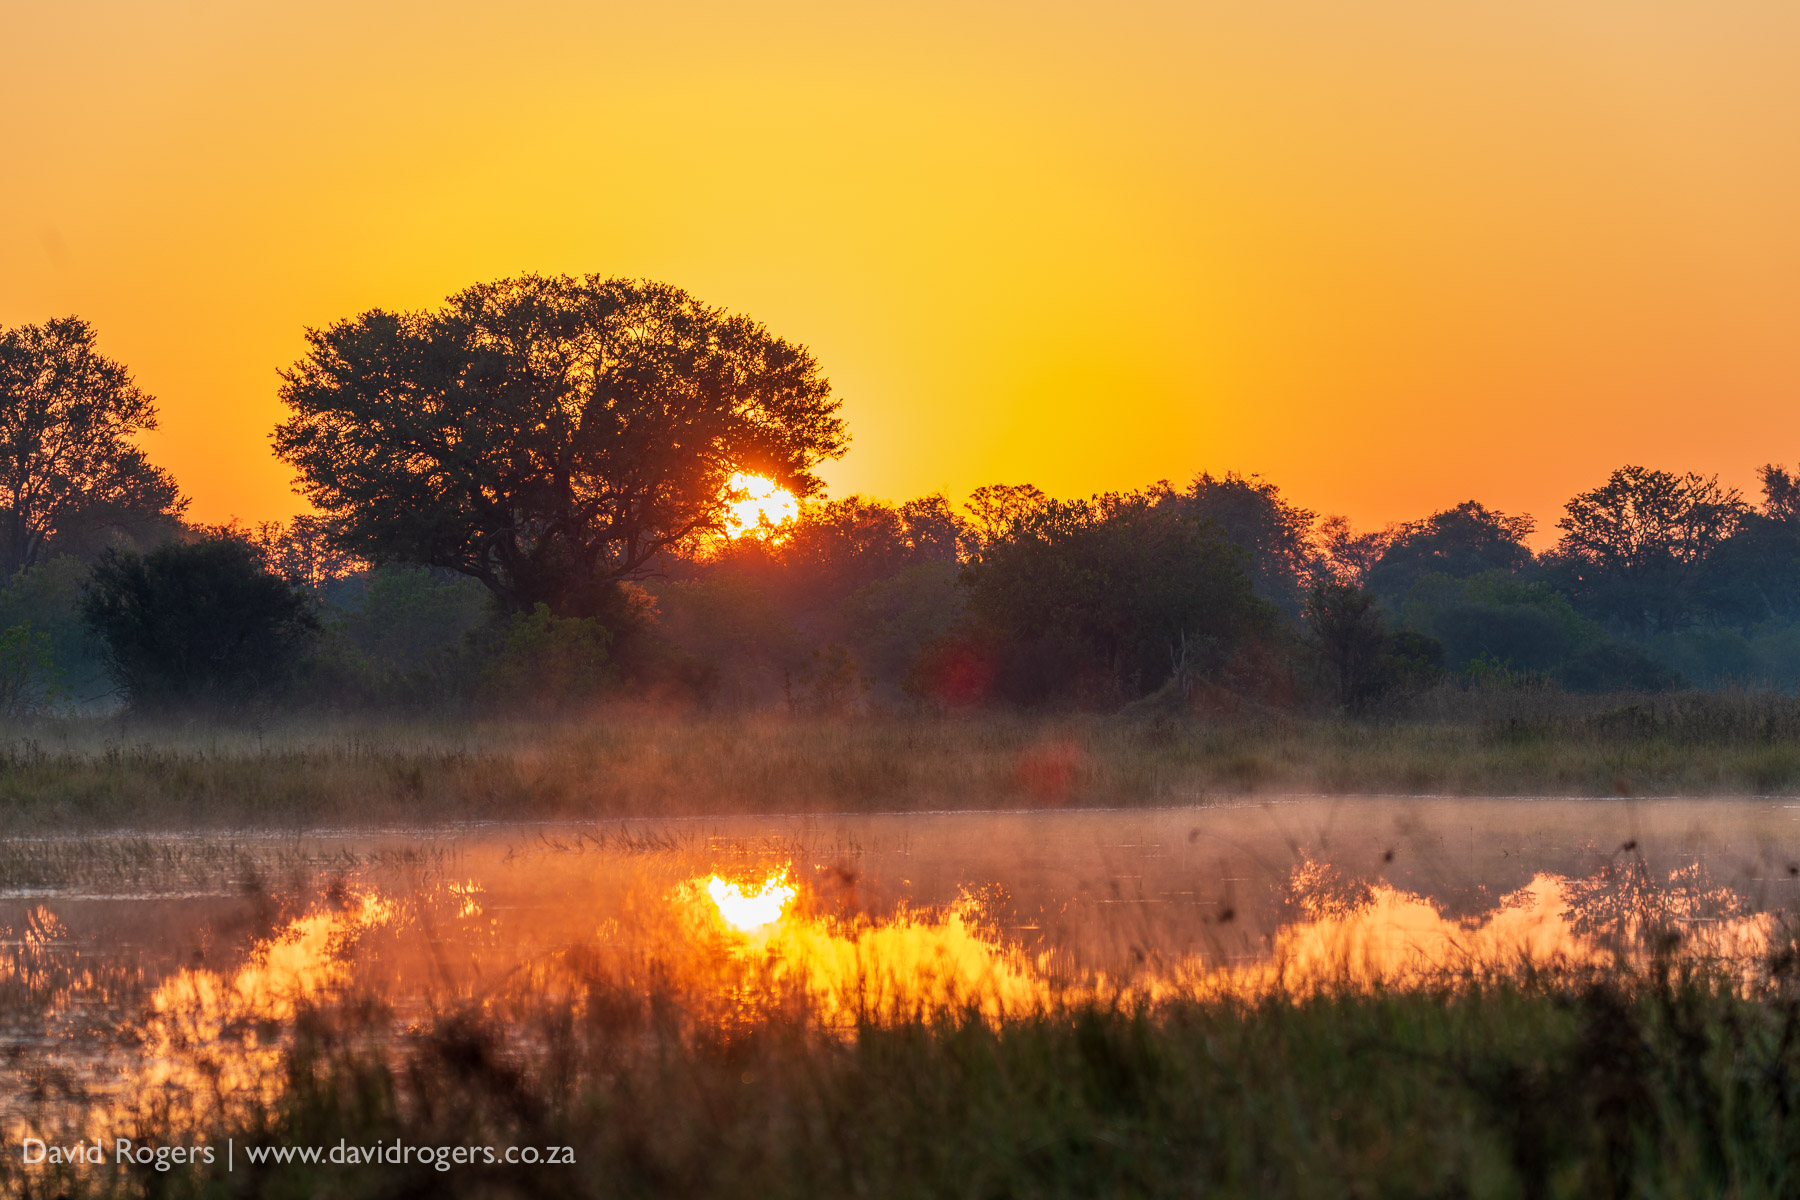 sunset shot on the Sigma 60-600mm f/4.5-6.3 DG OS HSM Sports lens